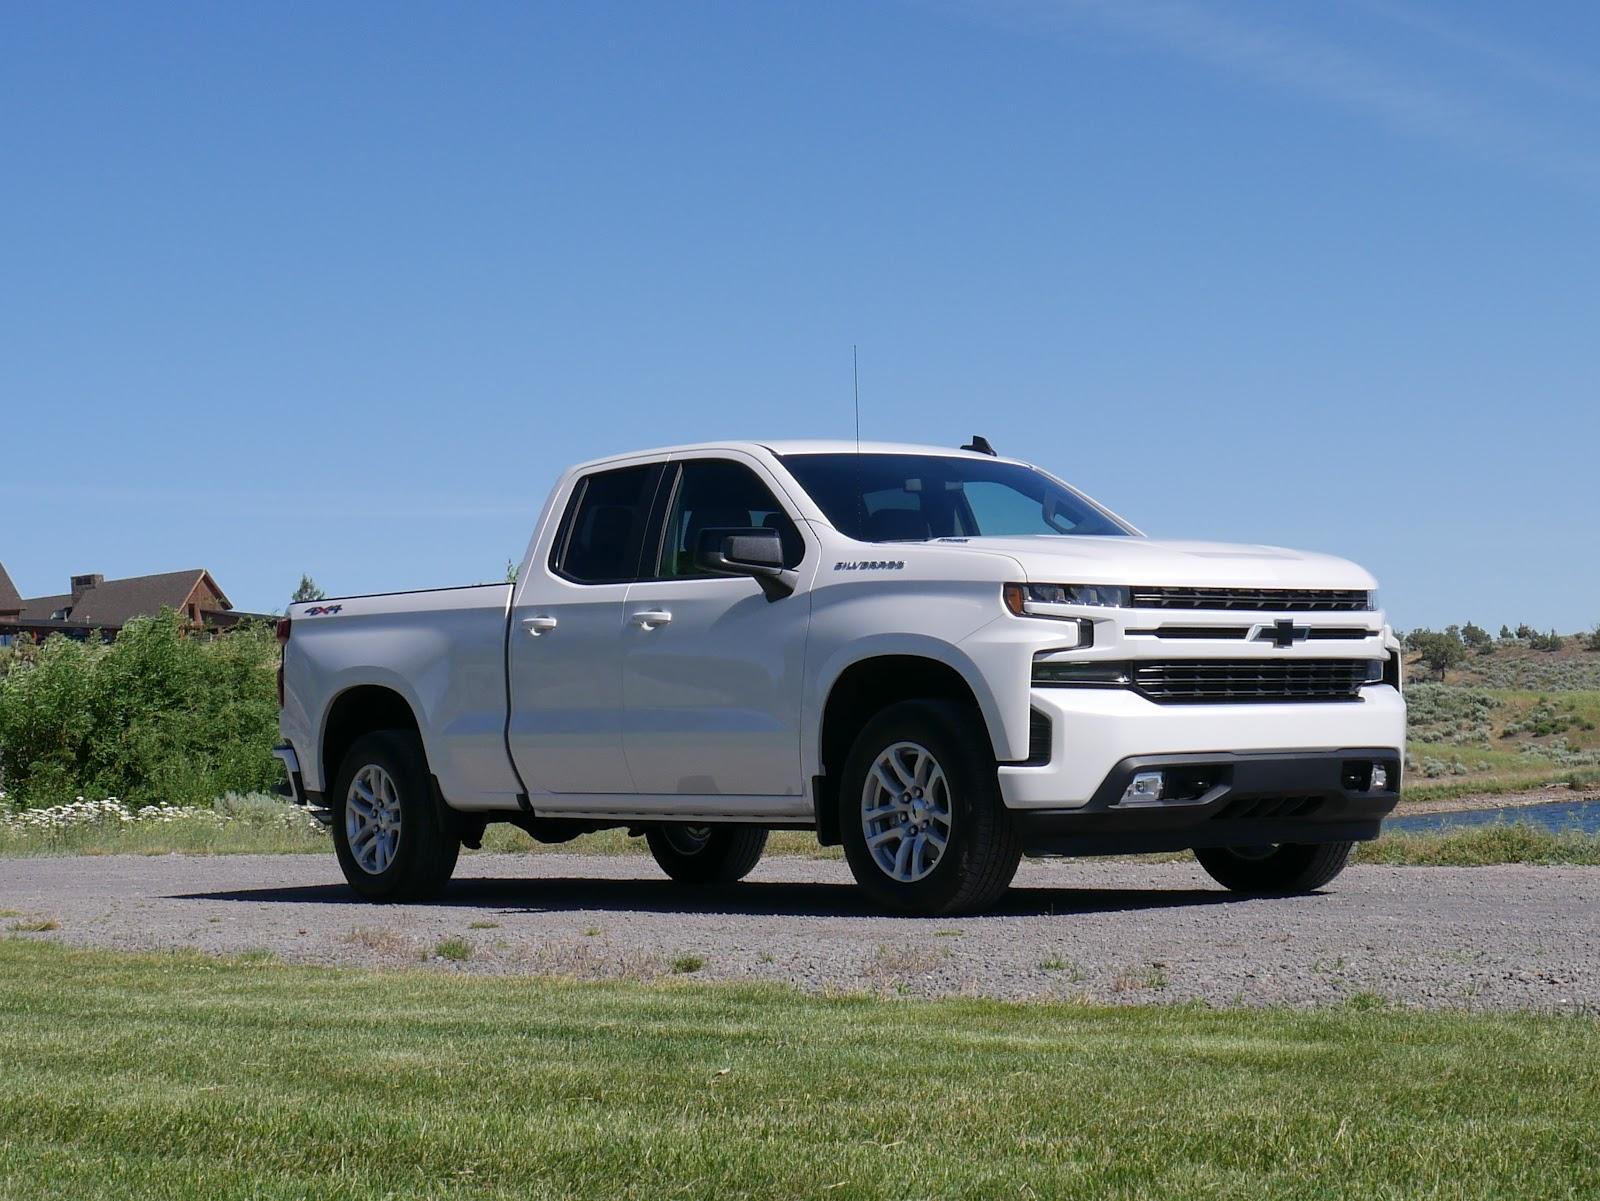 2020 Chevrolet Silverado 1500 Duramax Diesel